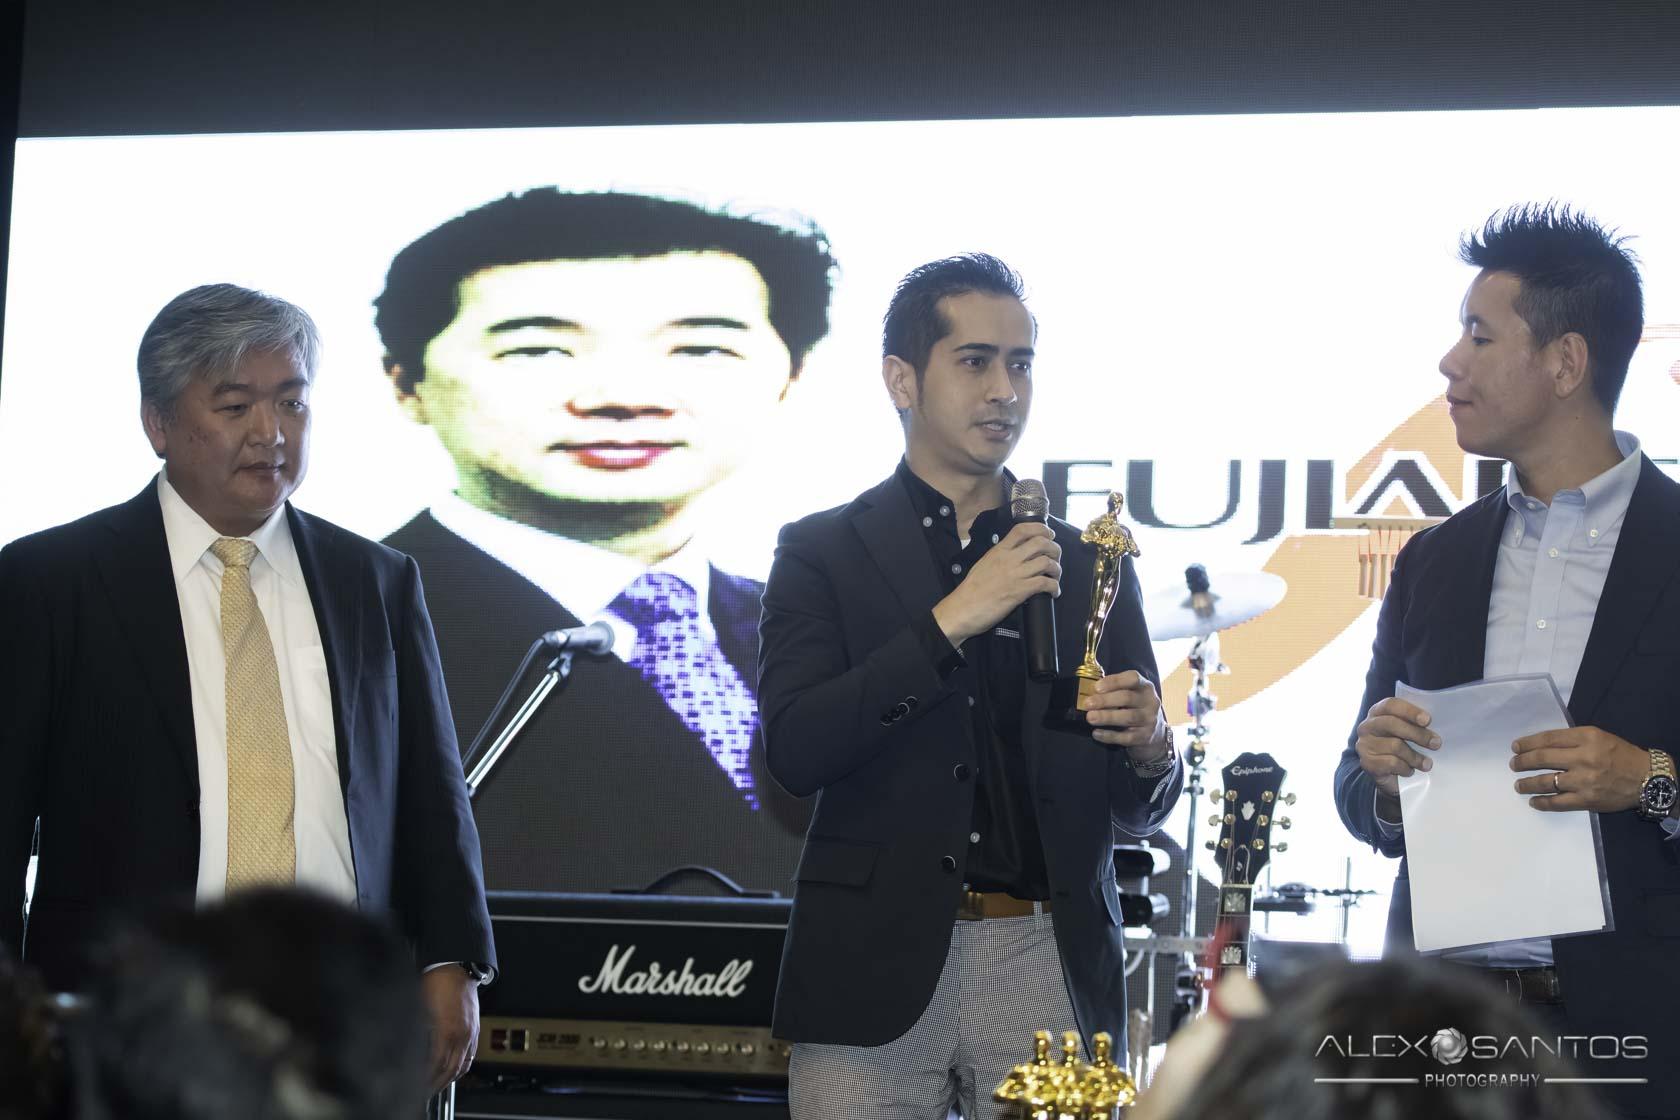 Yasunori Fusazaki da Fujiarte recebendo o prêmio Amigos da Comunidade